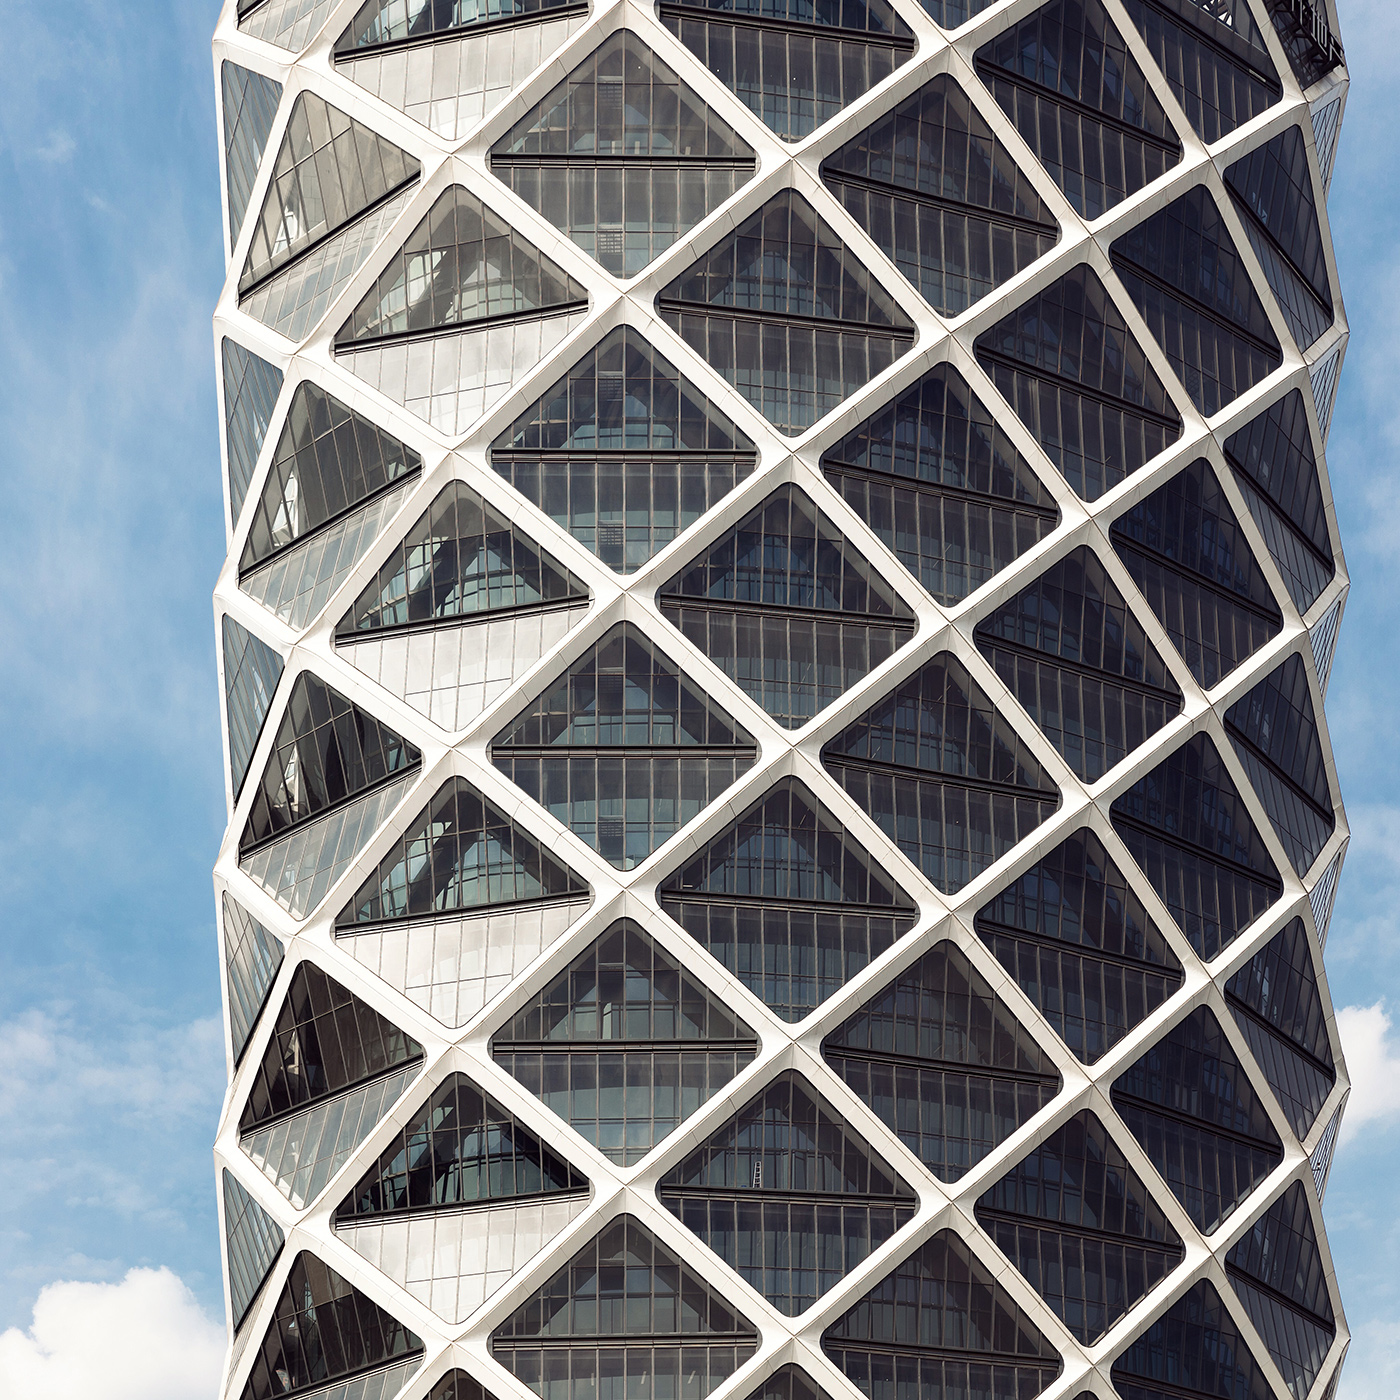 Poly International Plaza . Location: Beijing, China . Architect: Skidmore, Owings & Merrill